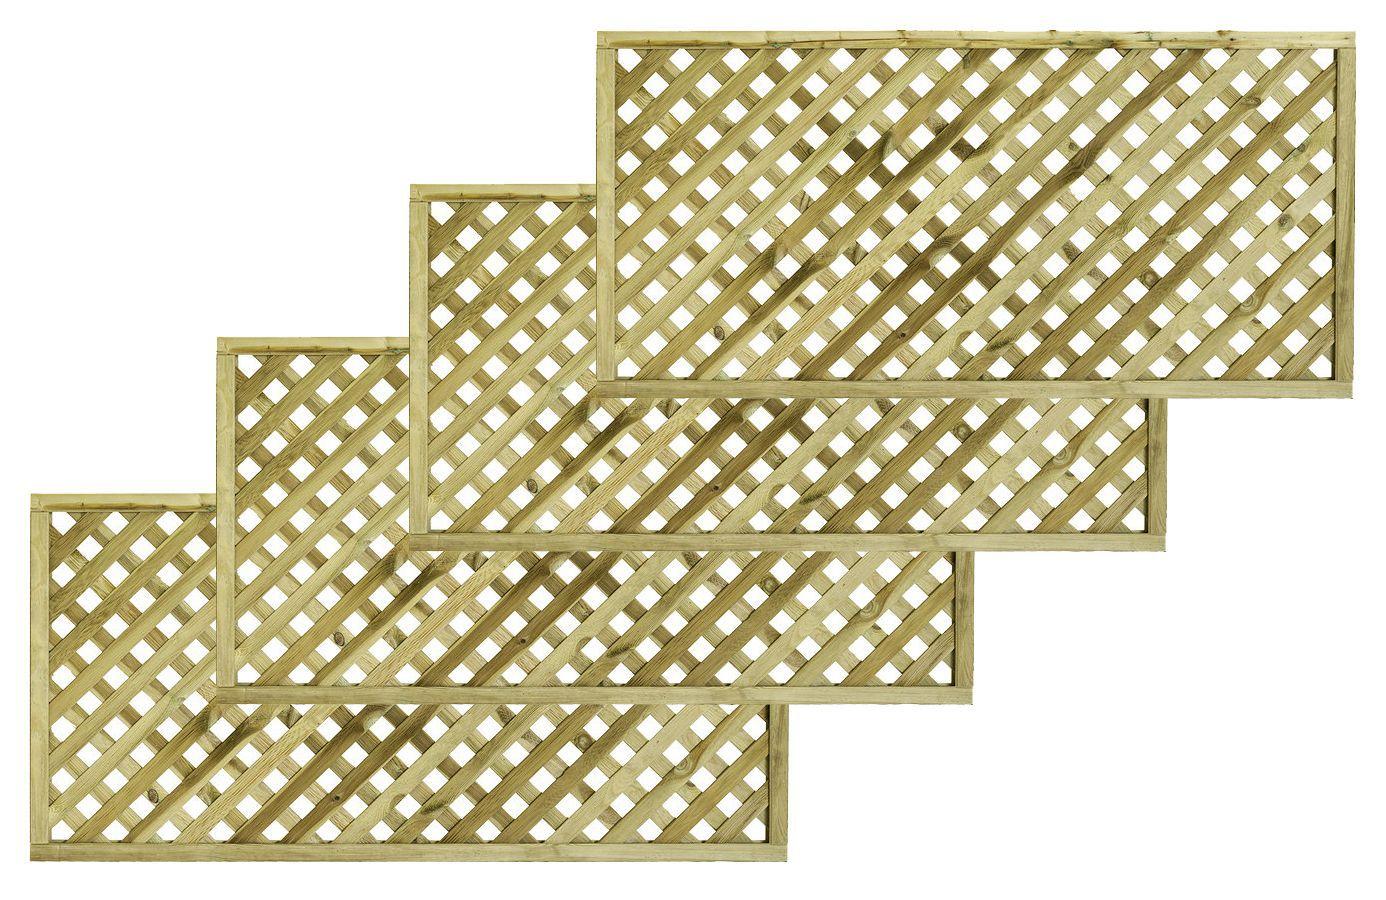 Woodbury timber square trellis panel h 1 8m w 900mm departments